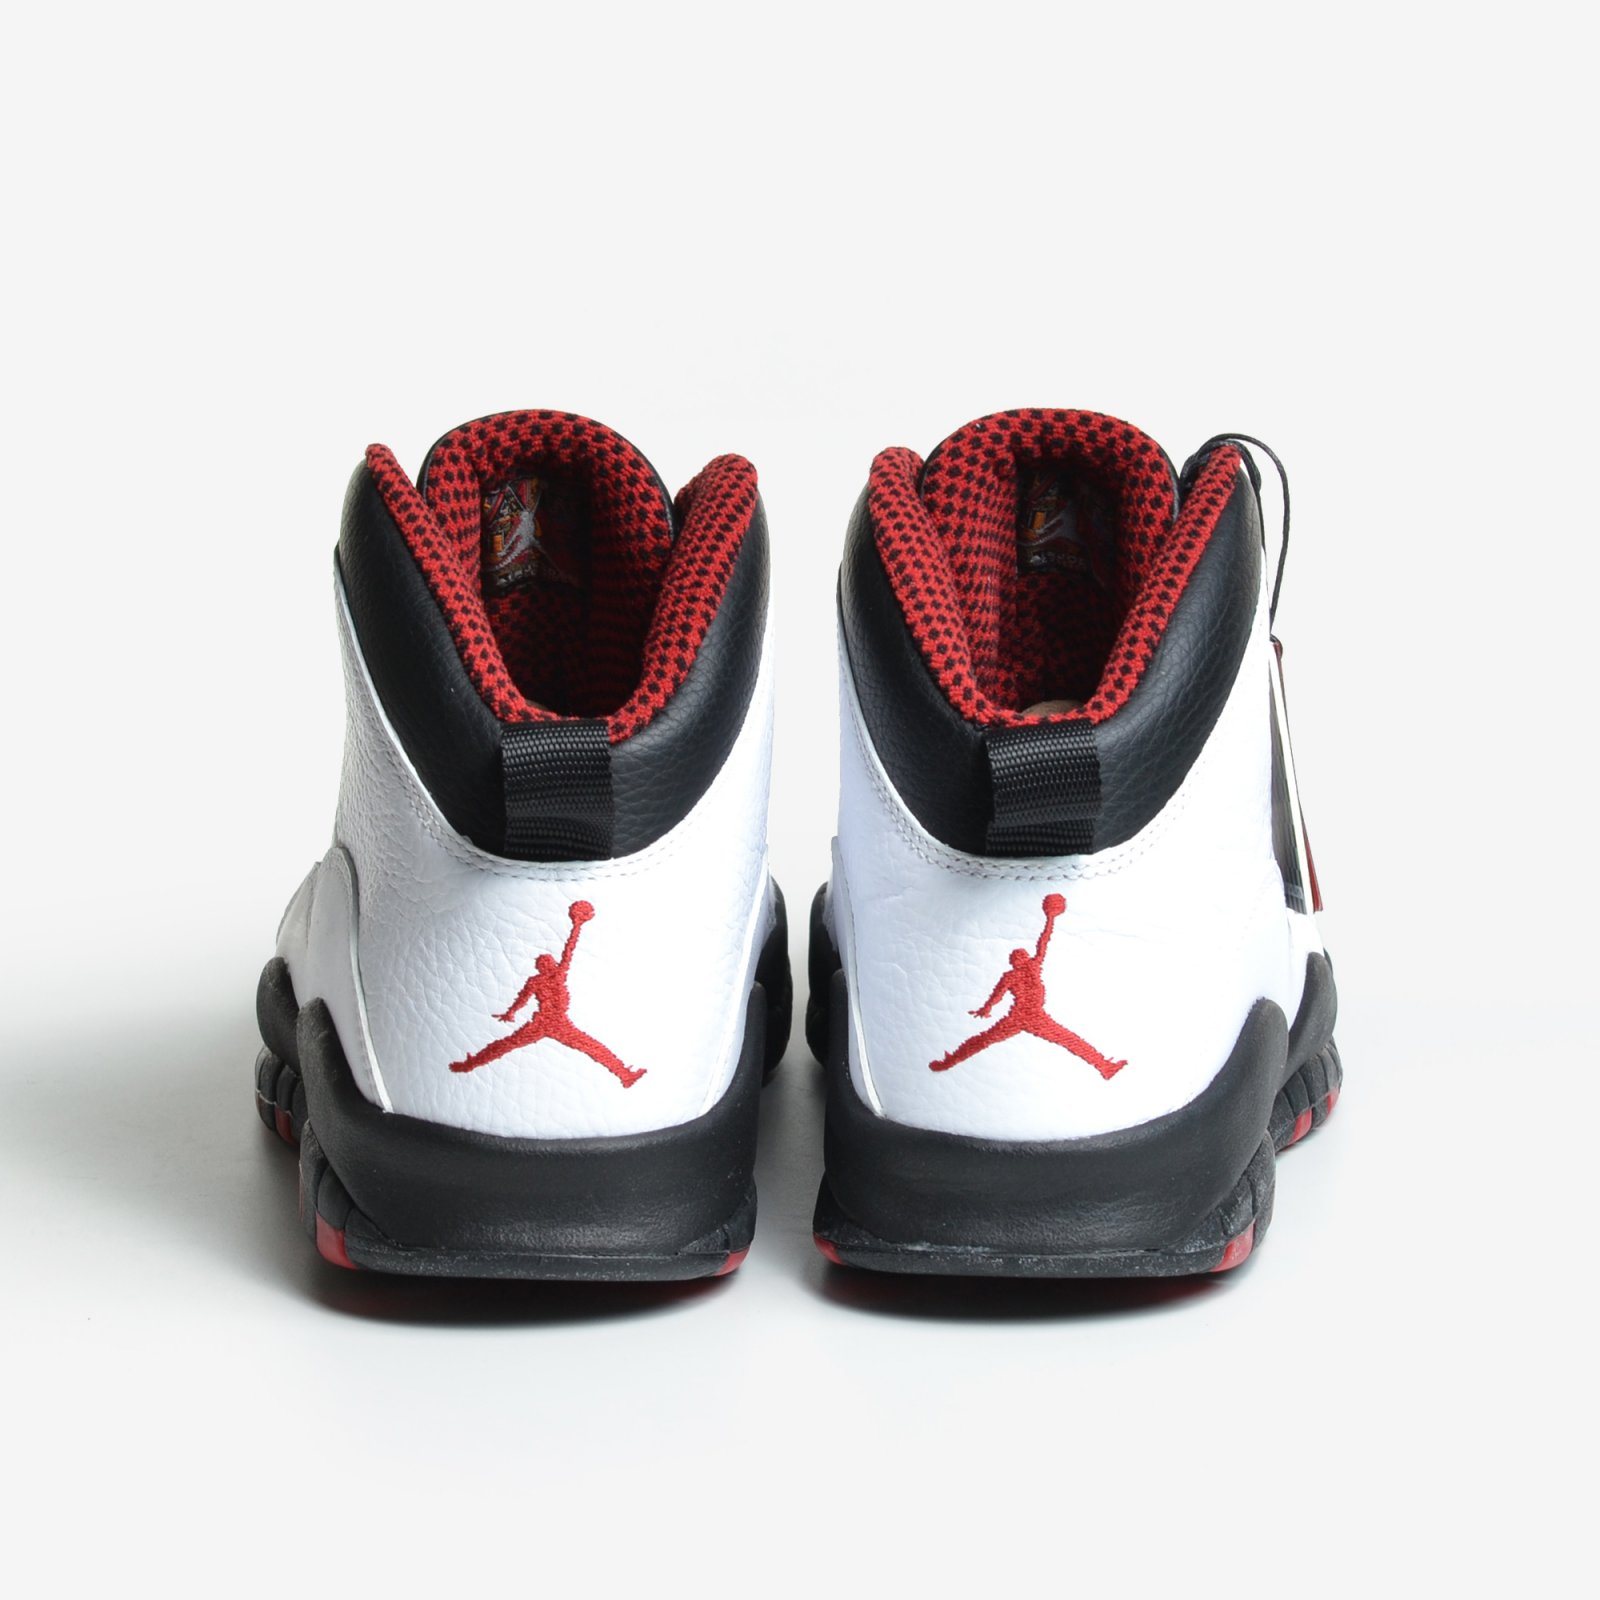 252cab3517c2dd Air Jordan 10 Retro Chicago White Varsity Red Black 2012 X Men s Nike  310805-100